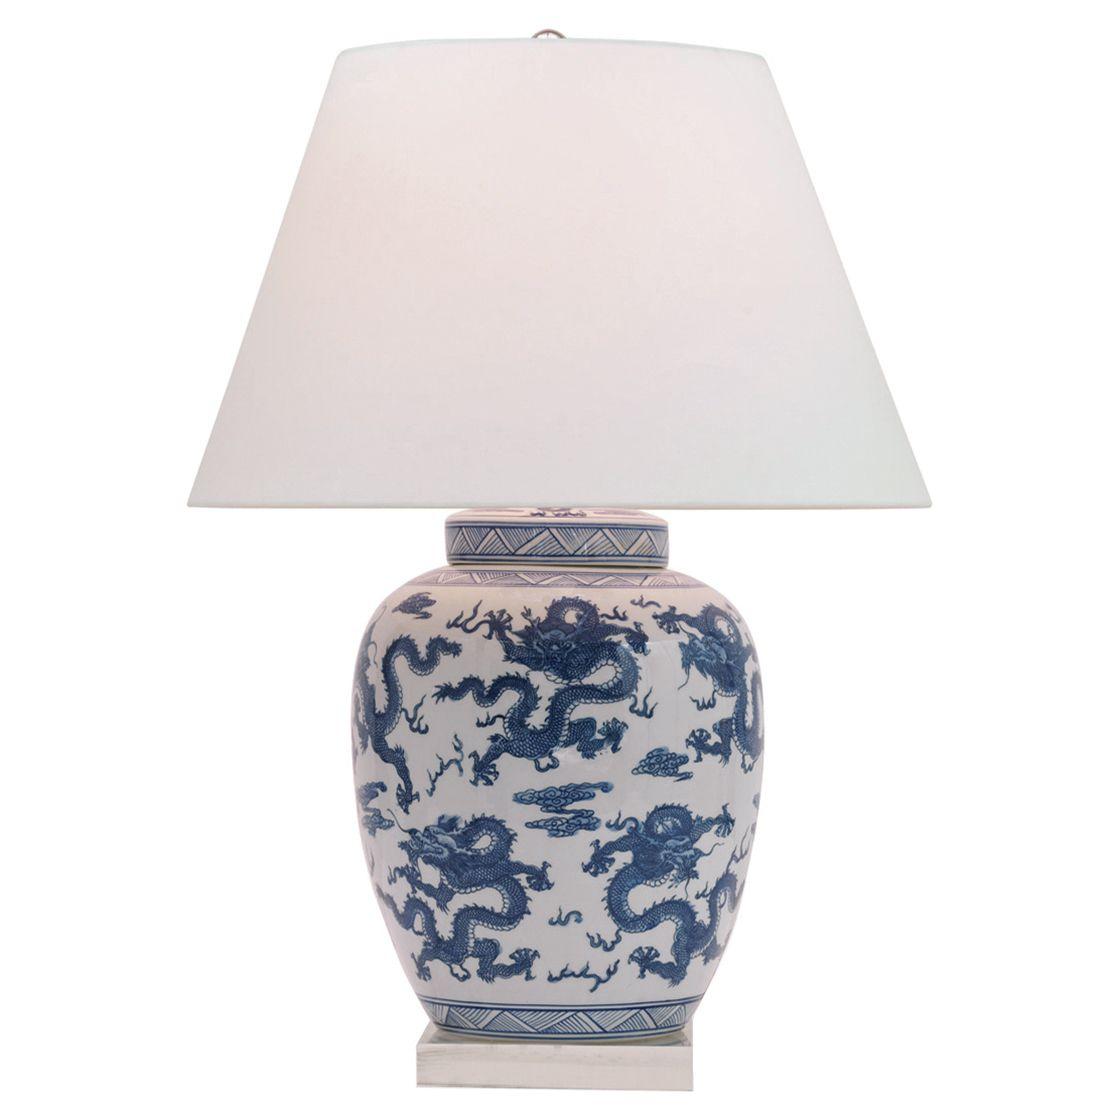 Cannon Global Blue Dragon Motif Porcelain Lucite Table Lamp White Table Lamp Table Lamp Lamp